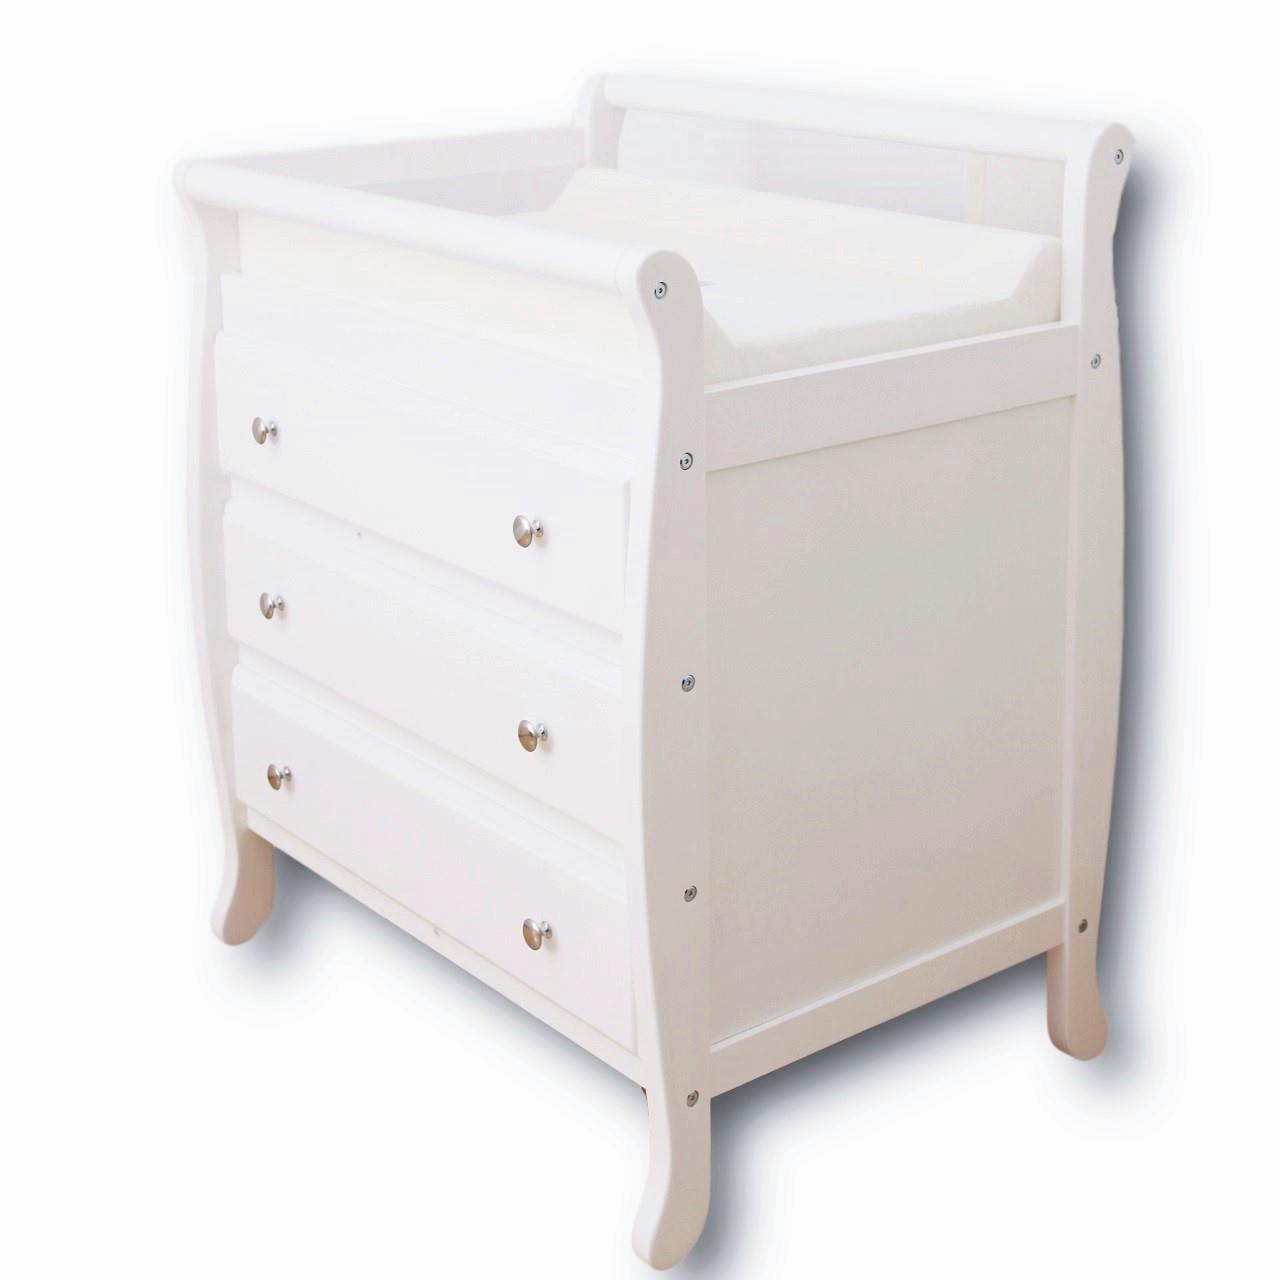 3 drawer white baby change table chest dresser cabinet changer nursery. Black Bedroom Furniture Sets. Home Design Ideas